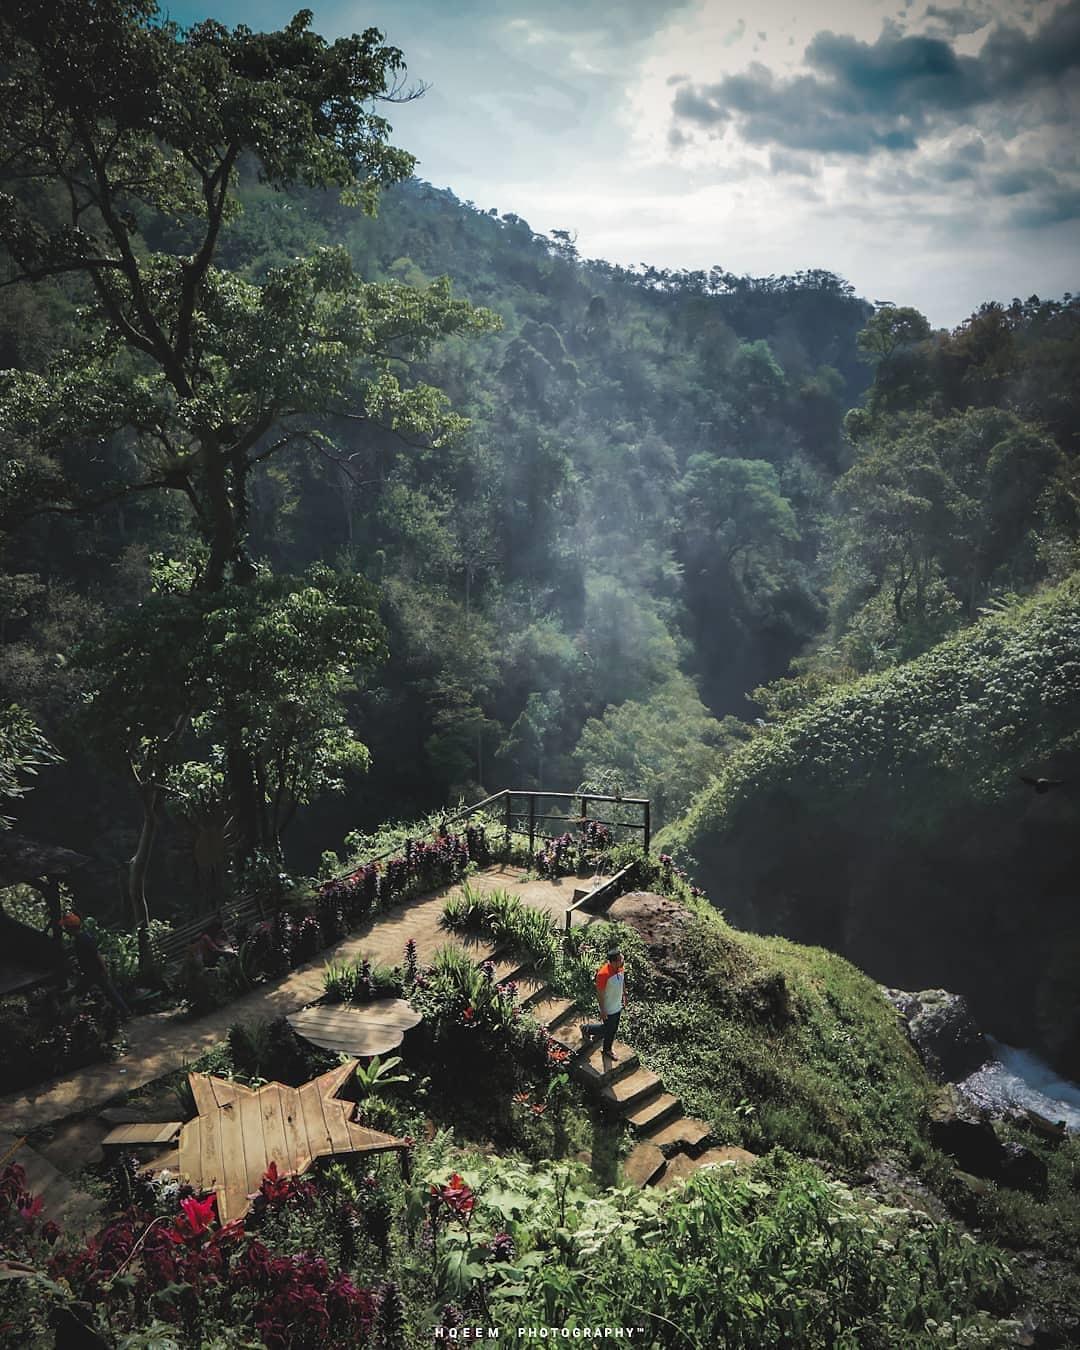 Coban Srengenge Malang